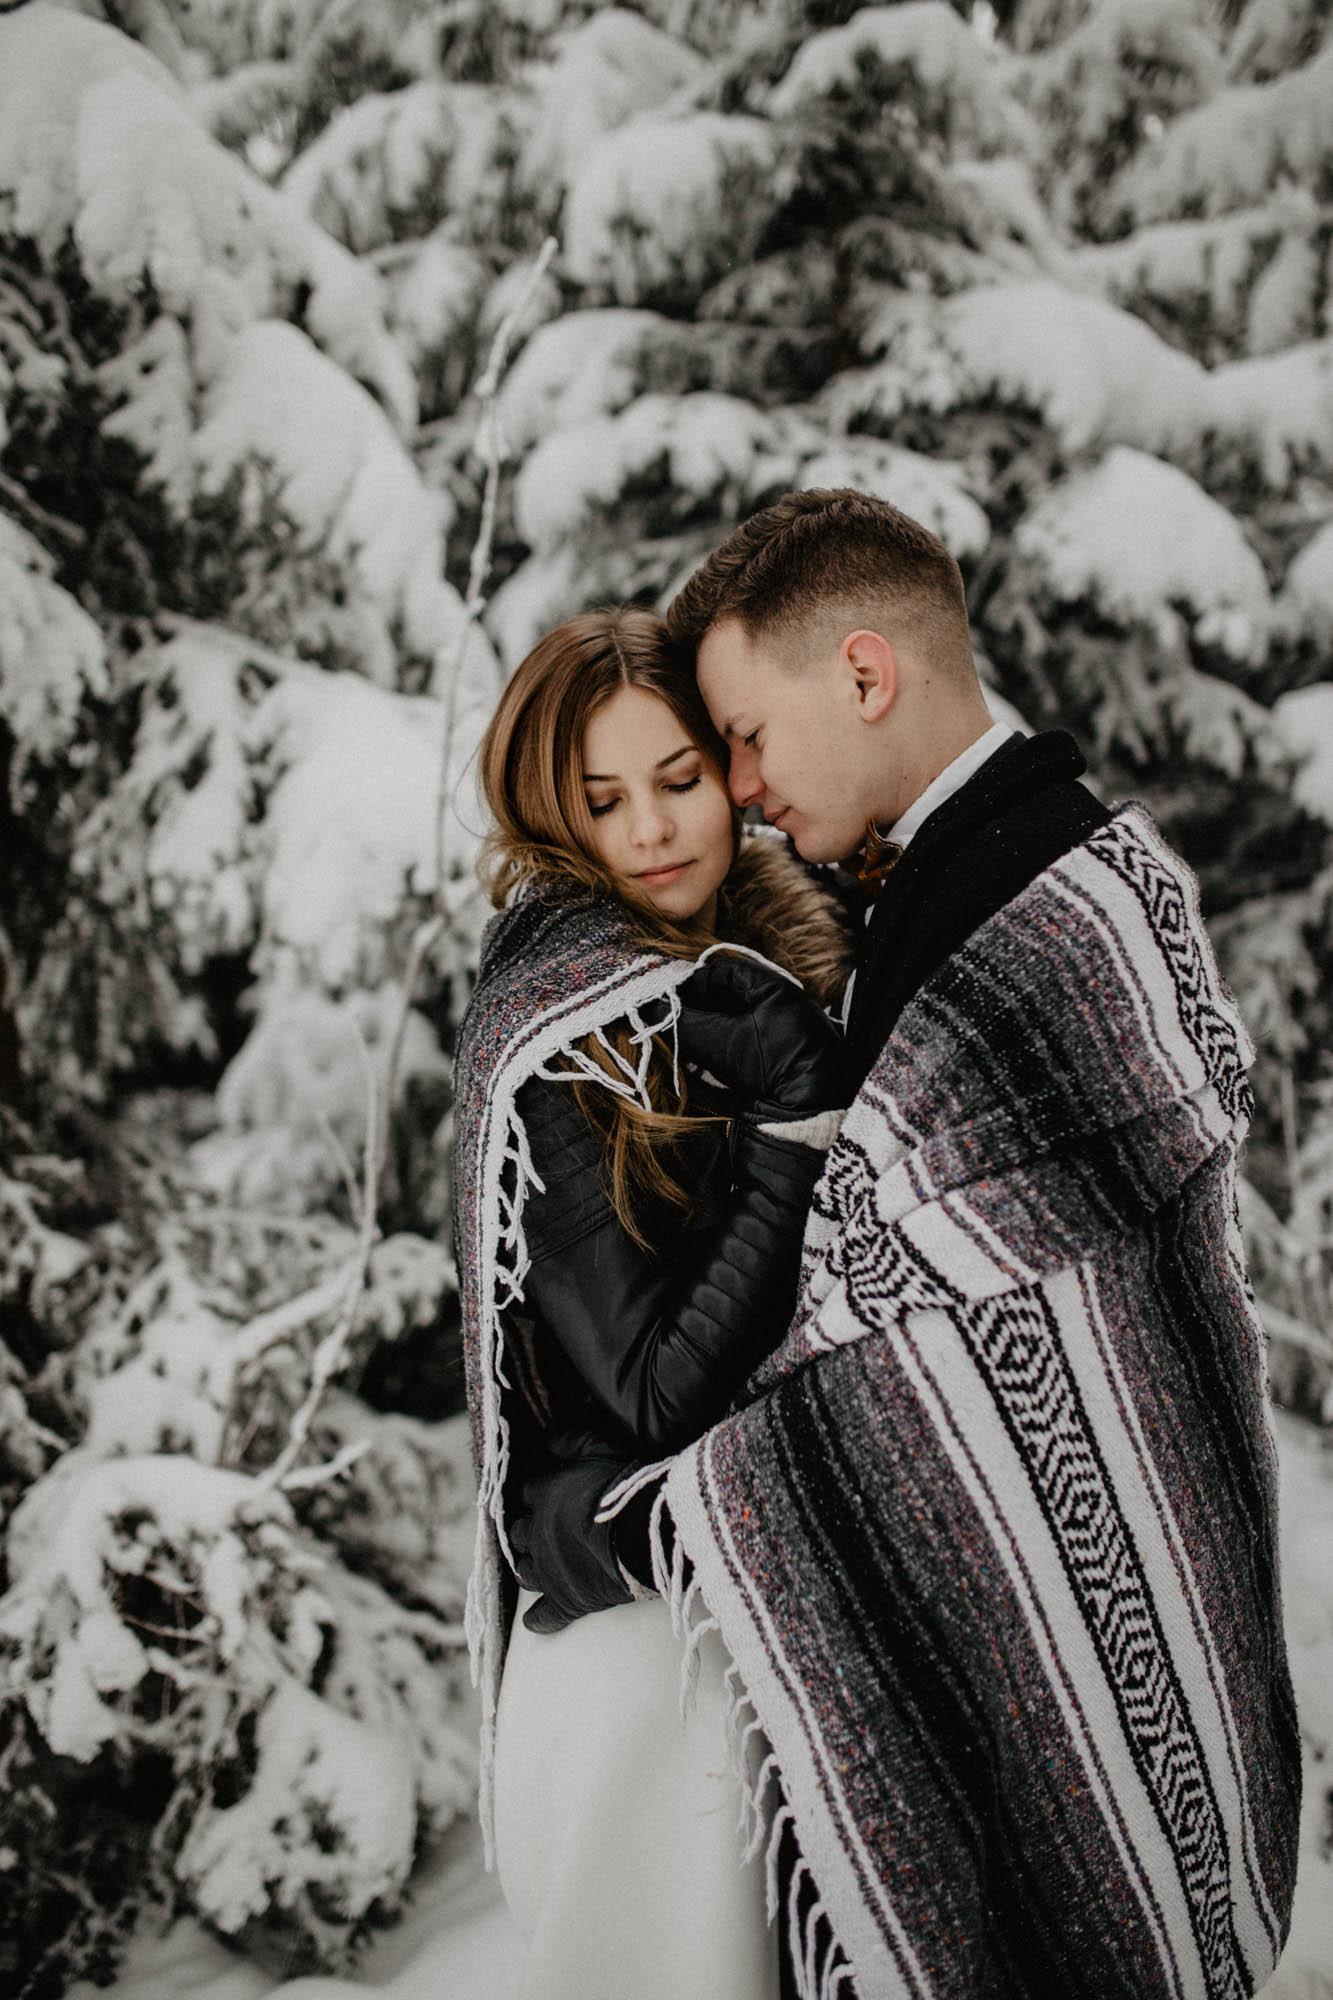 ashley_schulman_photography-winter_wedding_tampere-31.jpg